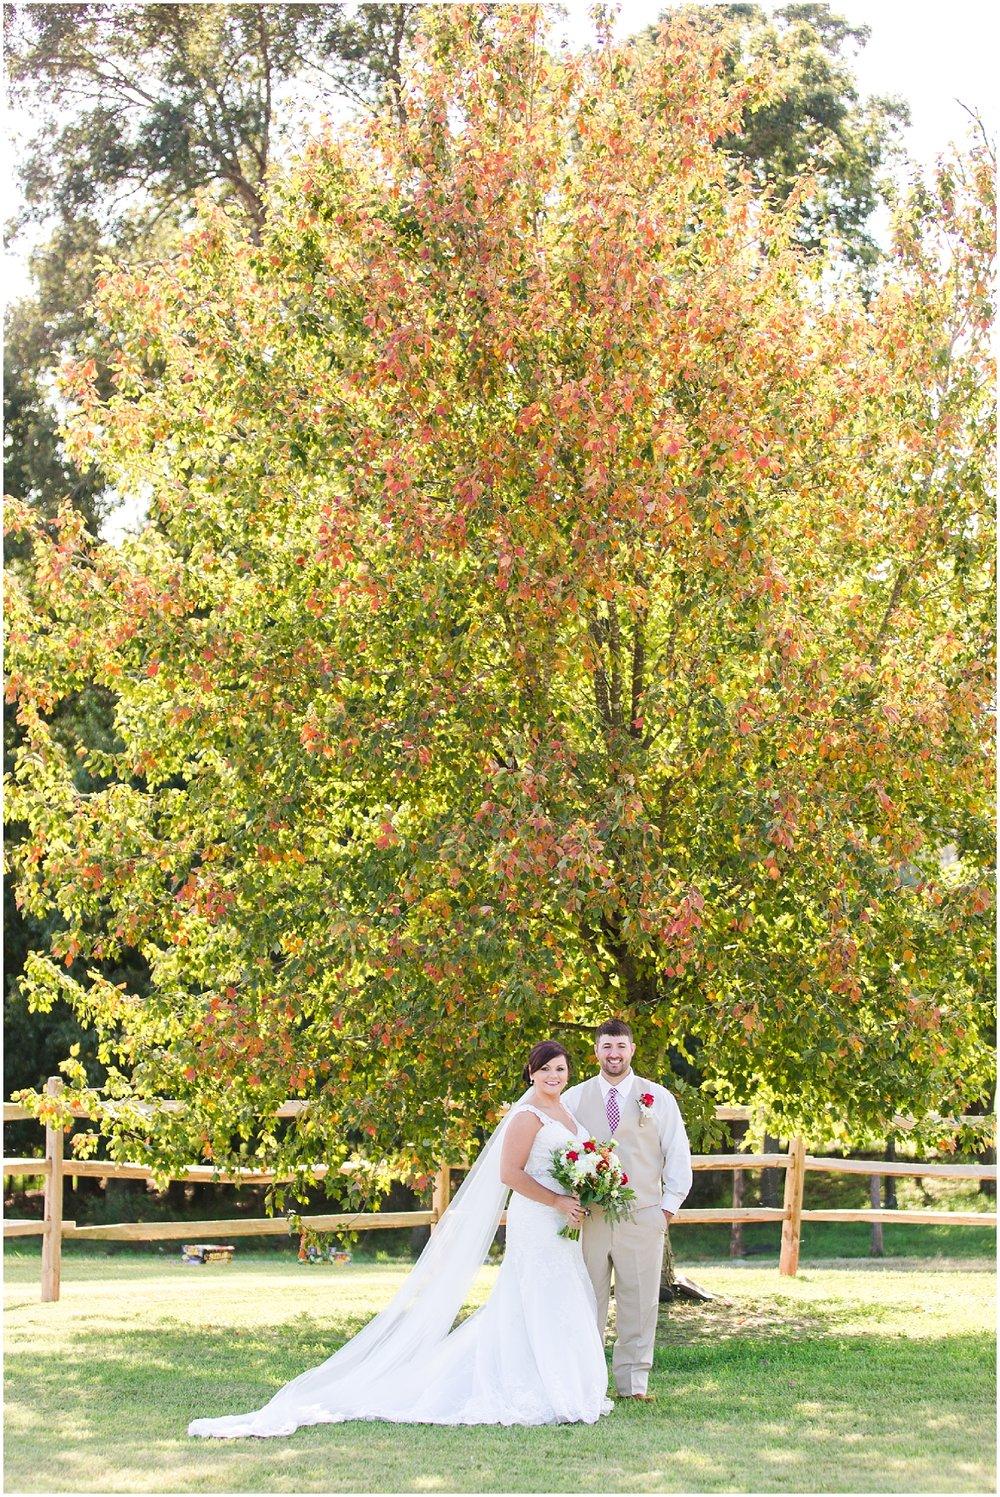 Rustic Country Wedding Virginia Photographer (12).jpg